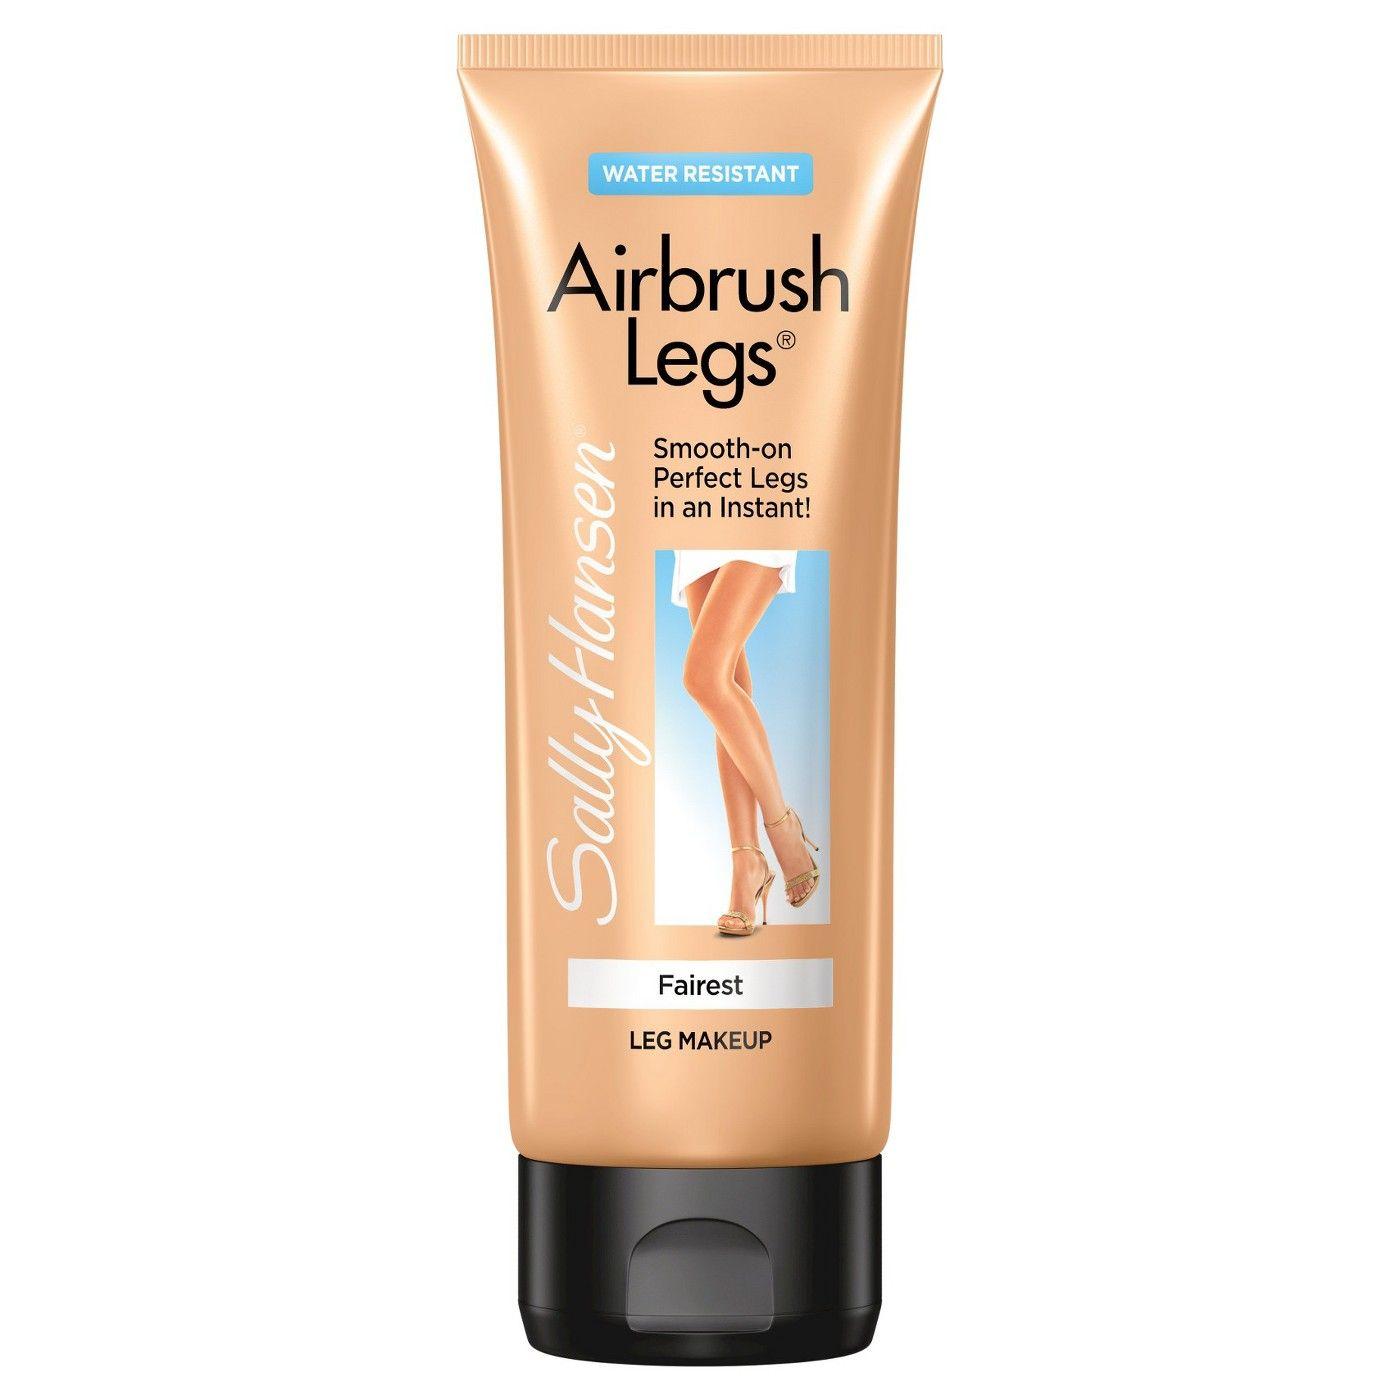 Sally Hansen Airbrush Legs Body Makeup Lotion 4 fl oz